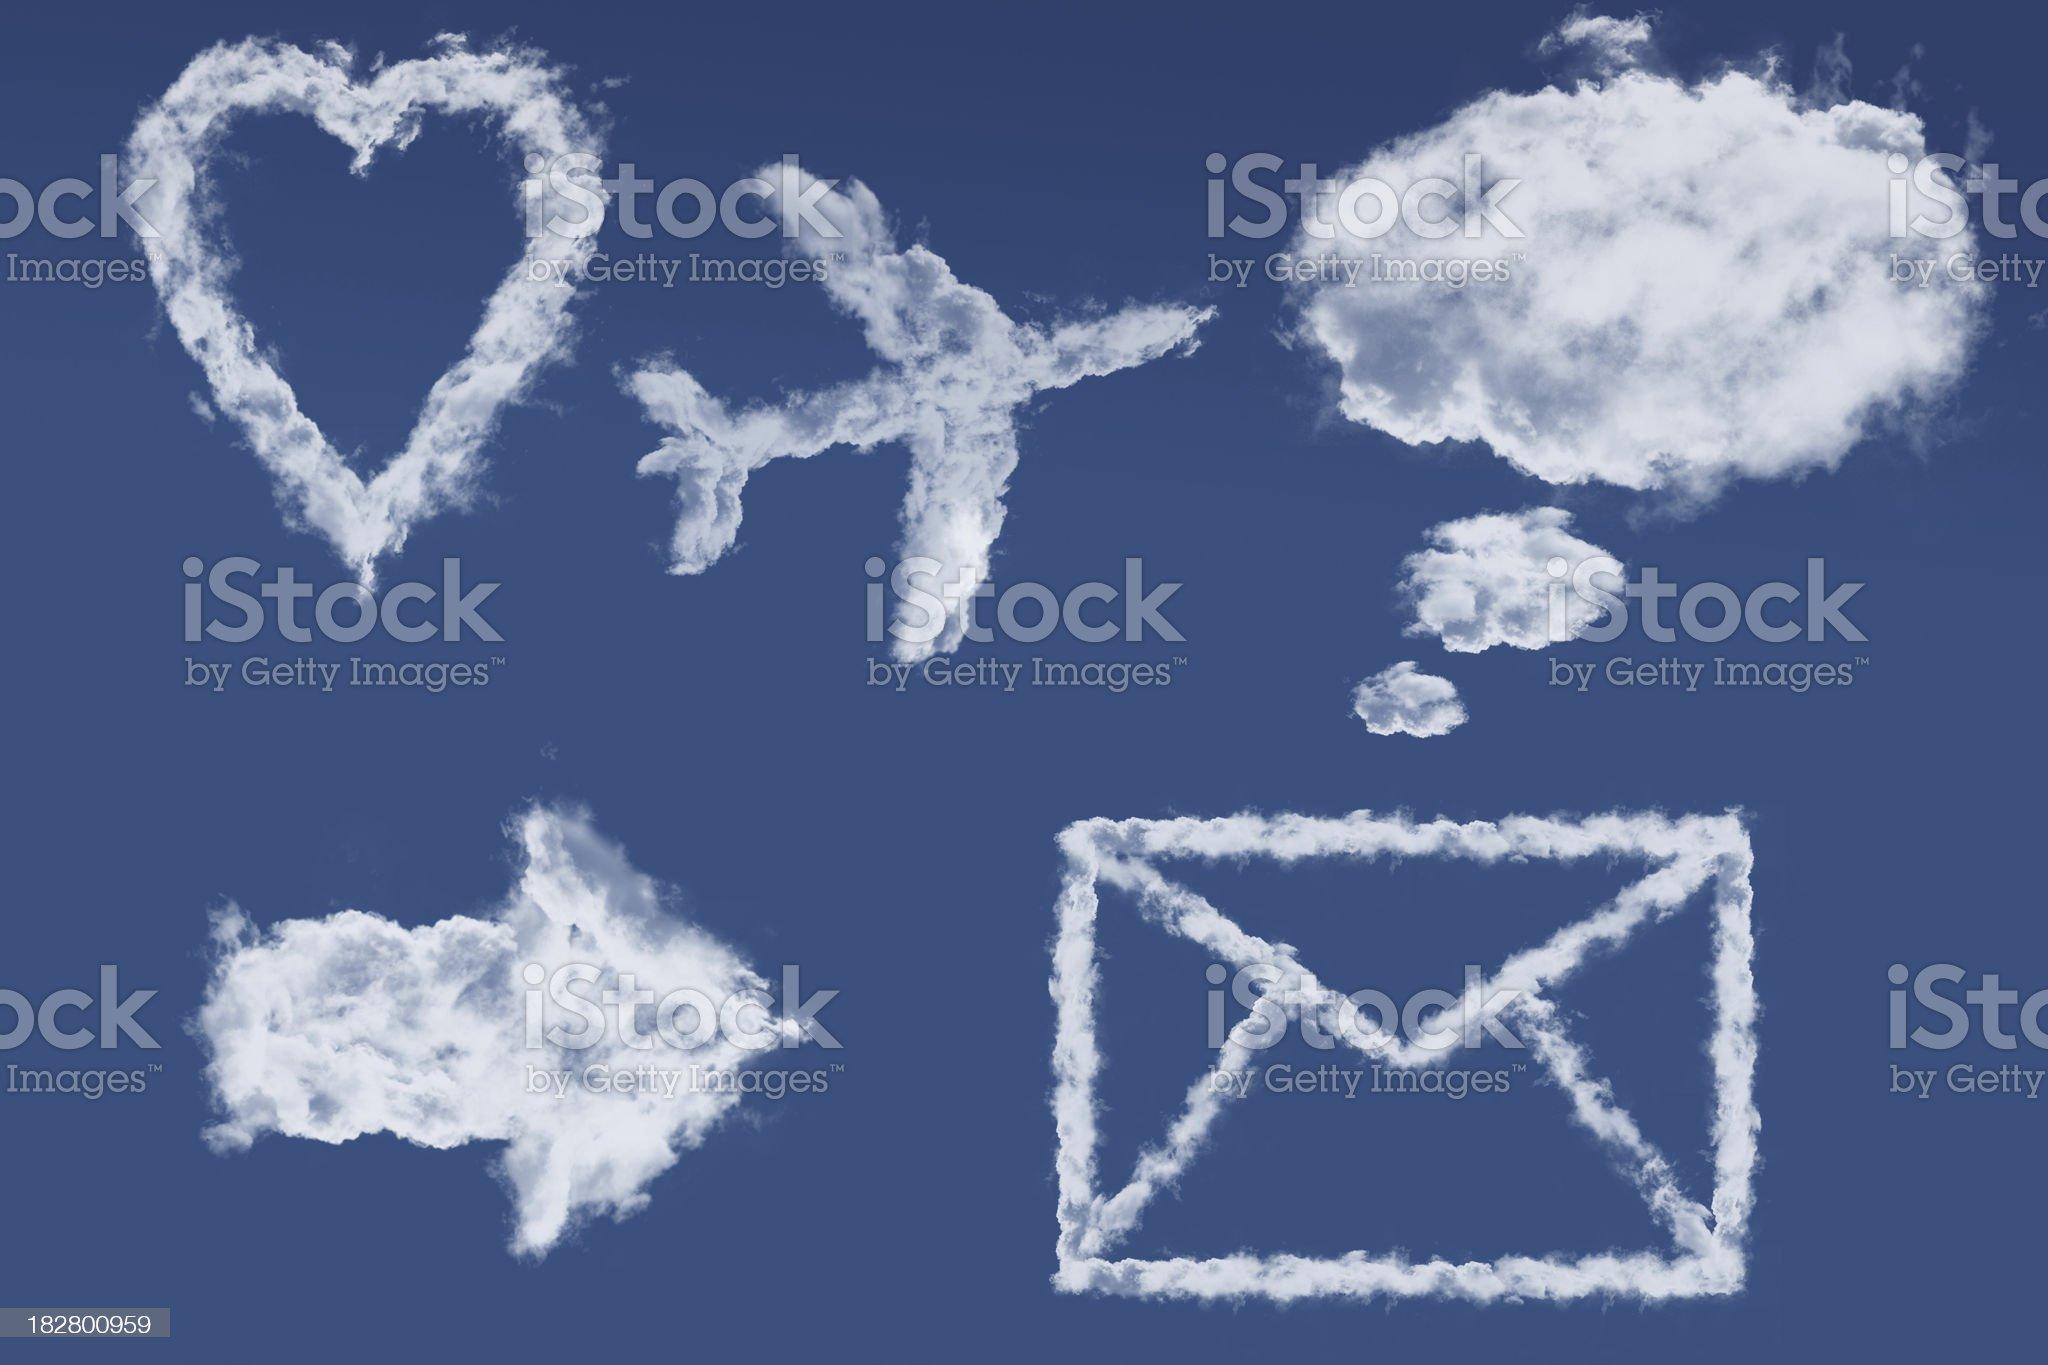 Cloud icon set royalty-free stock photo